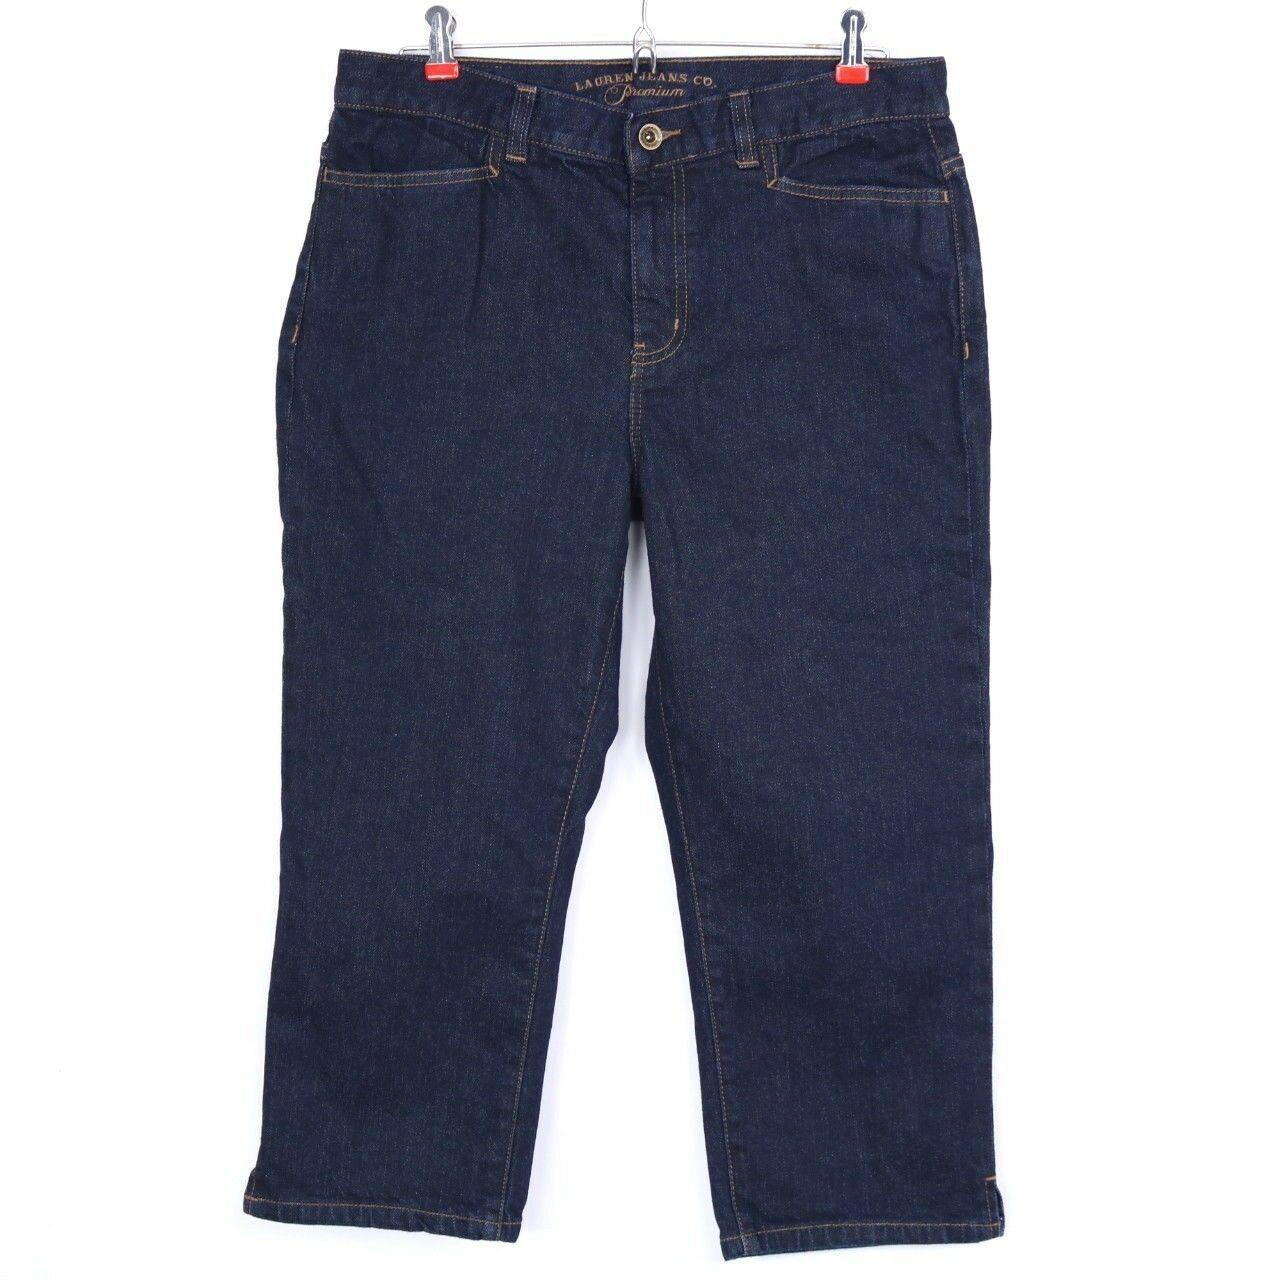 Lauren Jeans Co Womens Jeans Classic Midcalf Capri Cropped Size 8 Dark Stretch